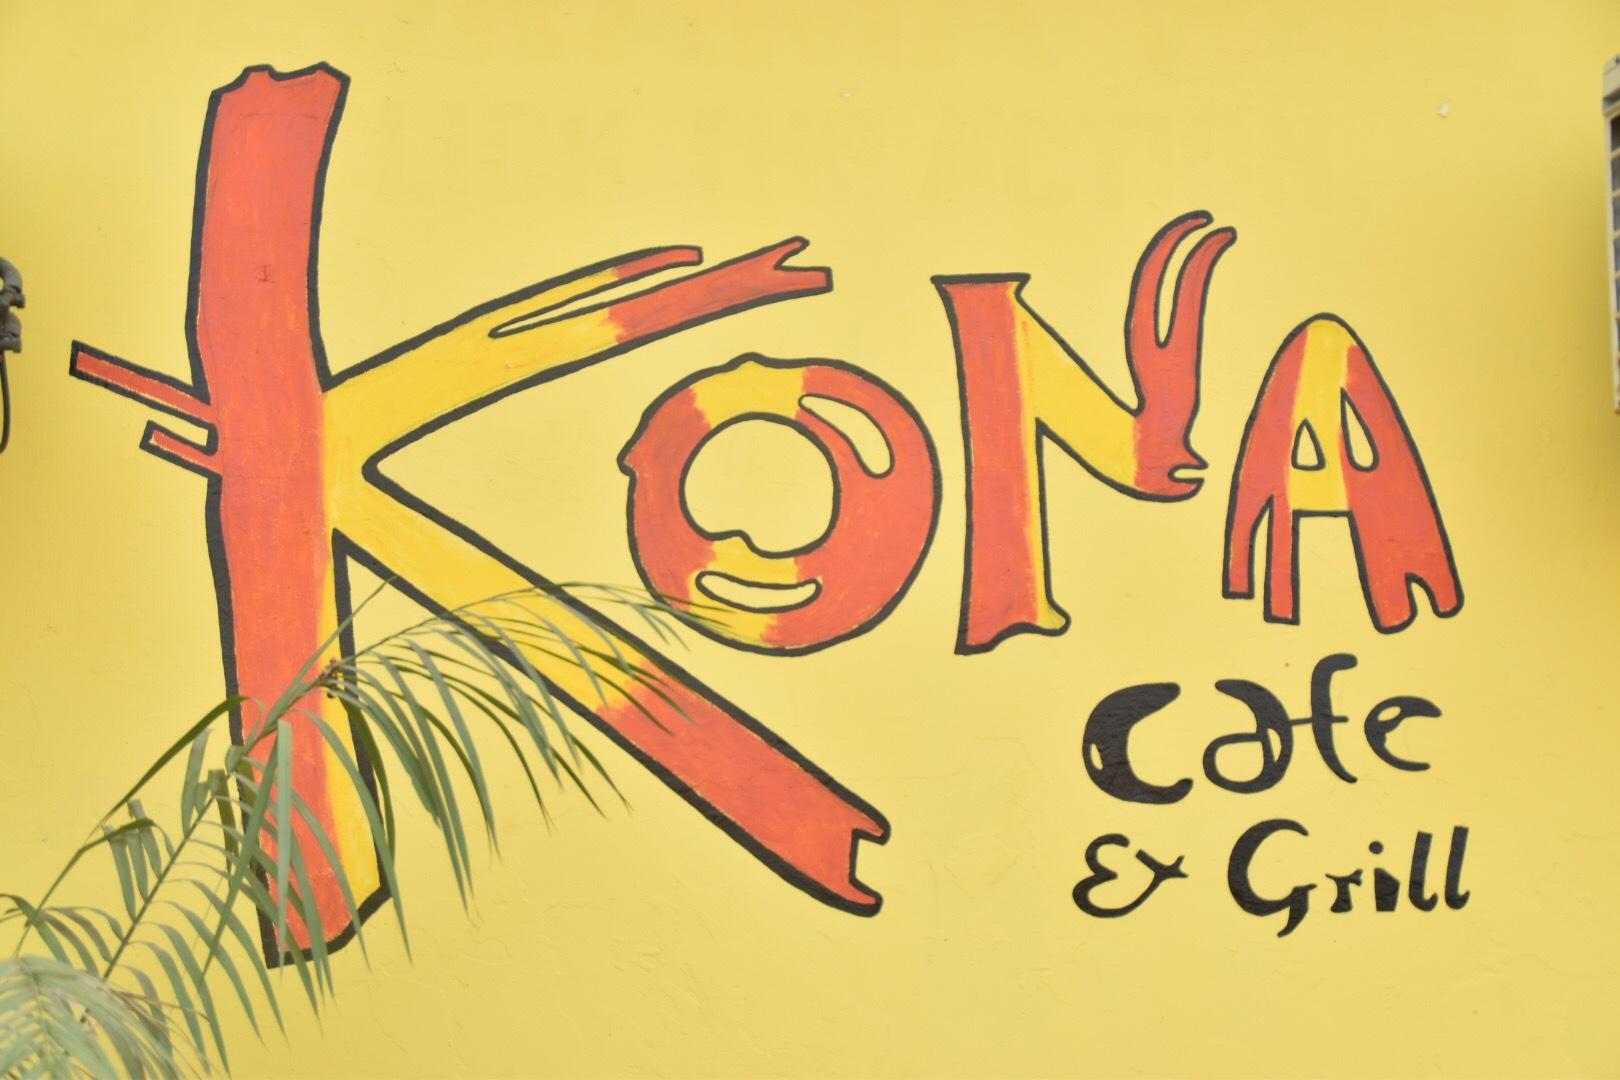 Kona Cafe & Grill